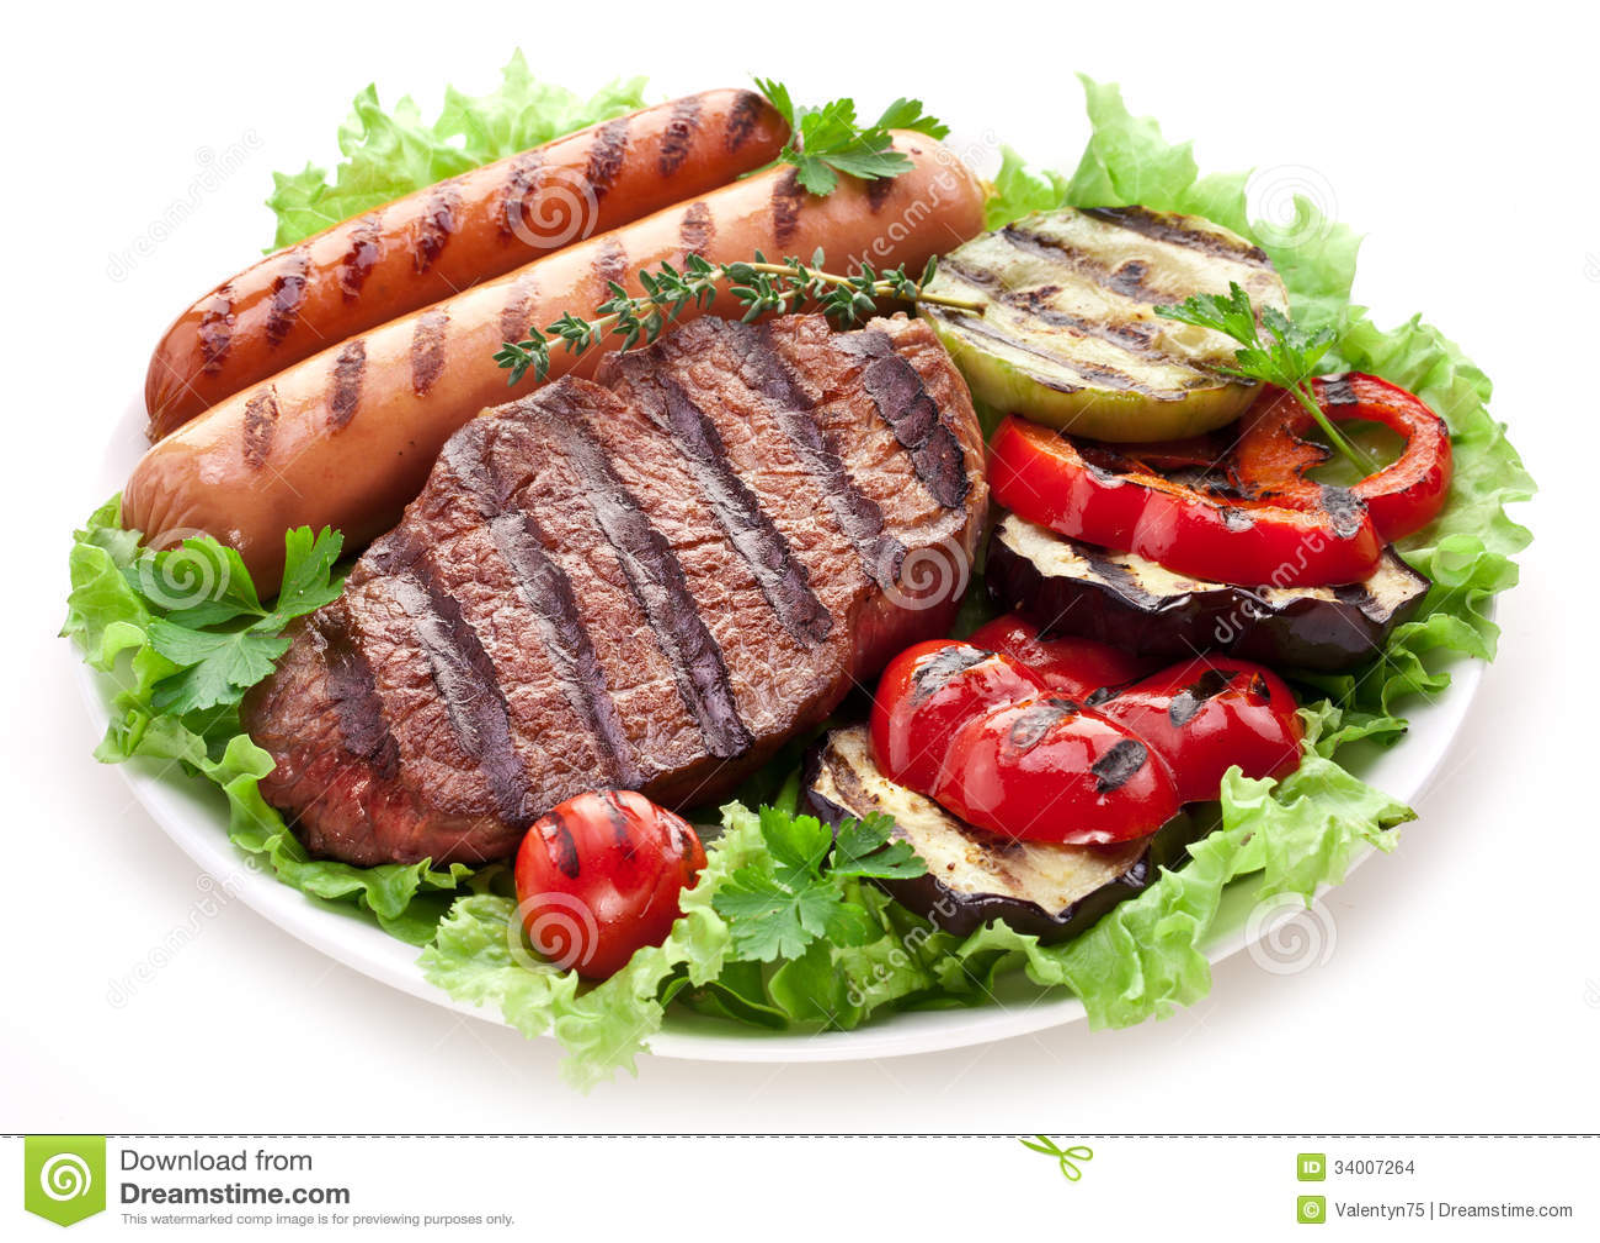 Bistecca arrostita, salsiccie e verdure.